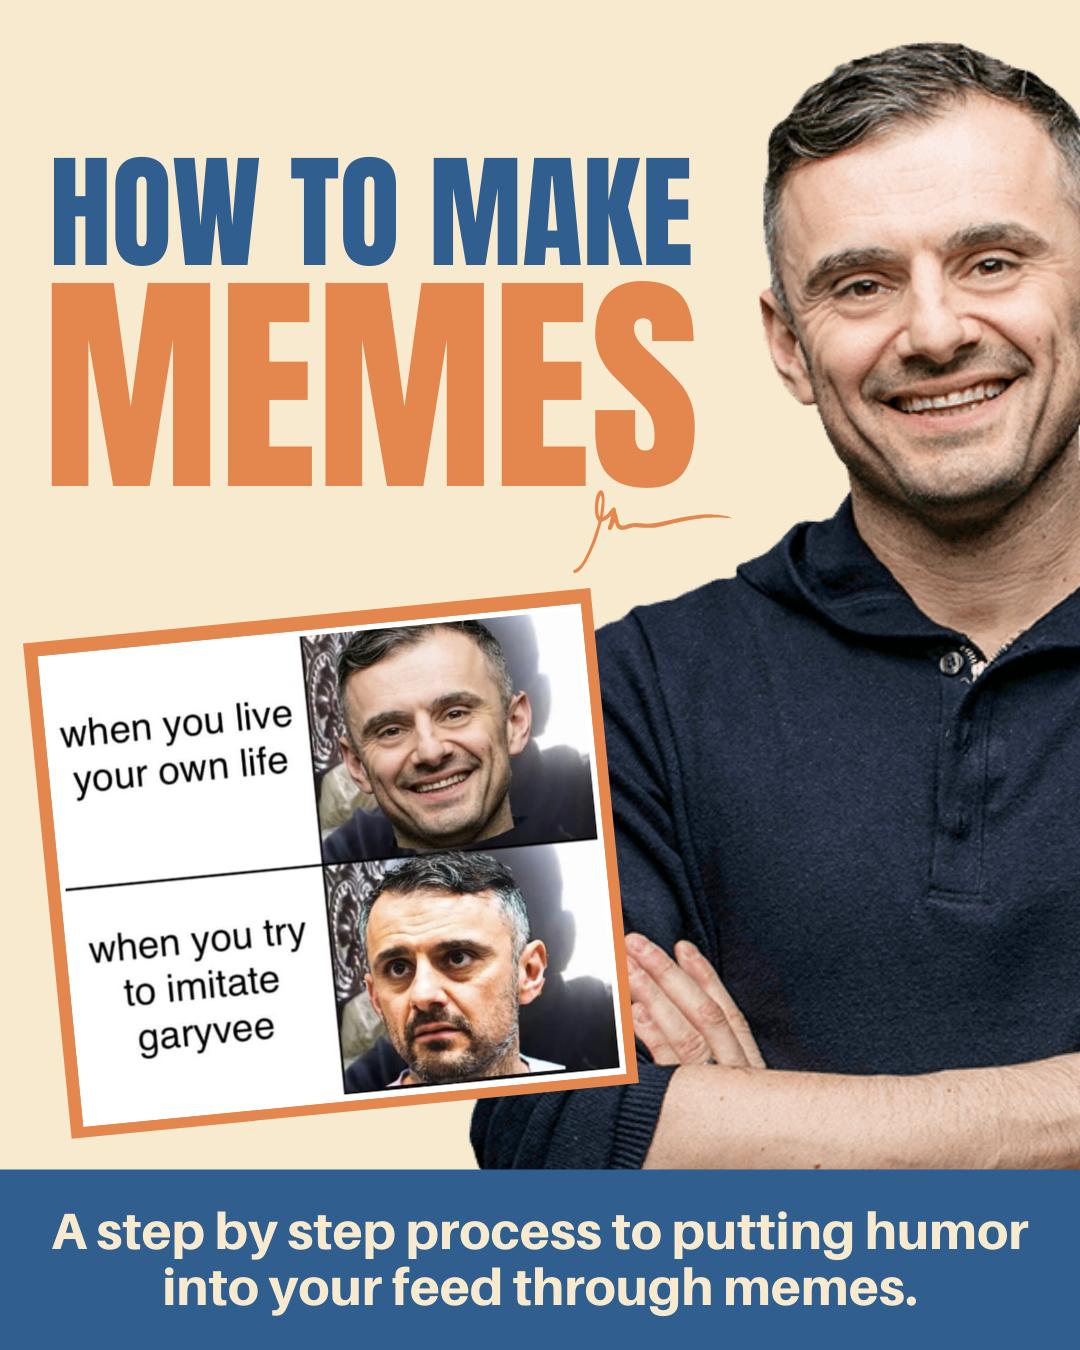 How To Make Memes How To Make Memes Gary Vee Memes